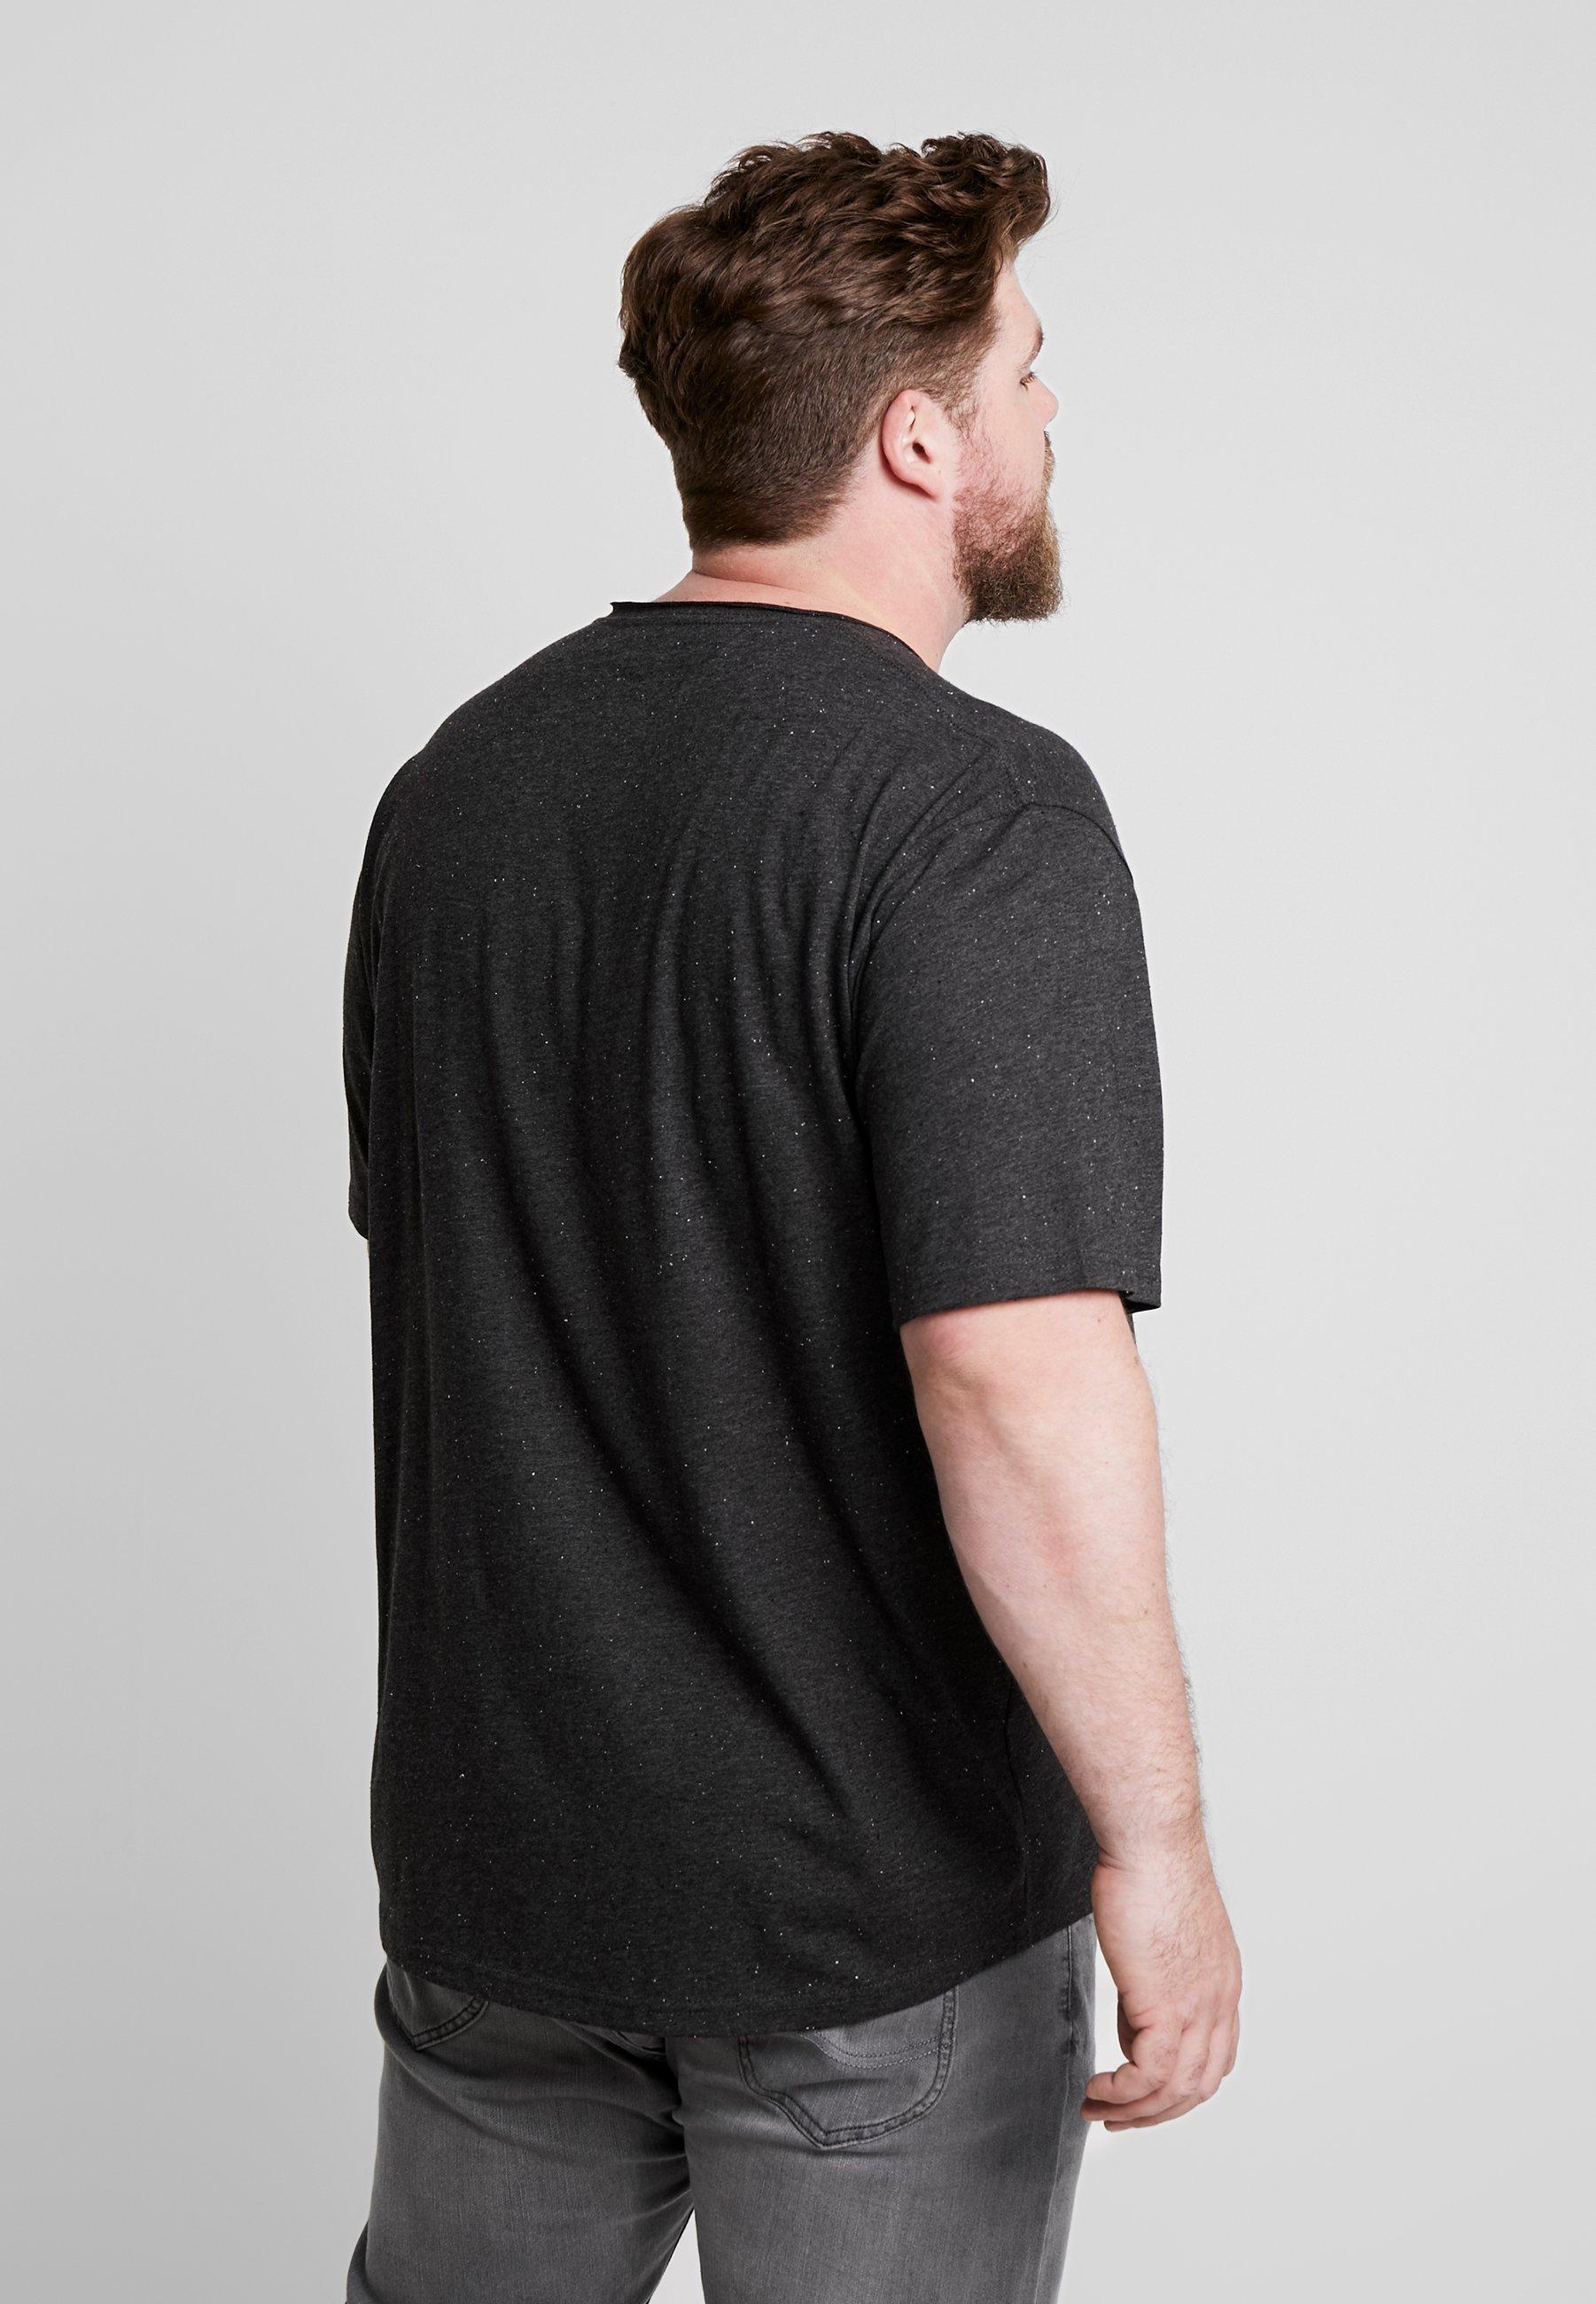 Embroidery TeeT Jack´s Hand Black Sportswear shirt Imprimé Mix NOPkn0wX8